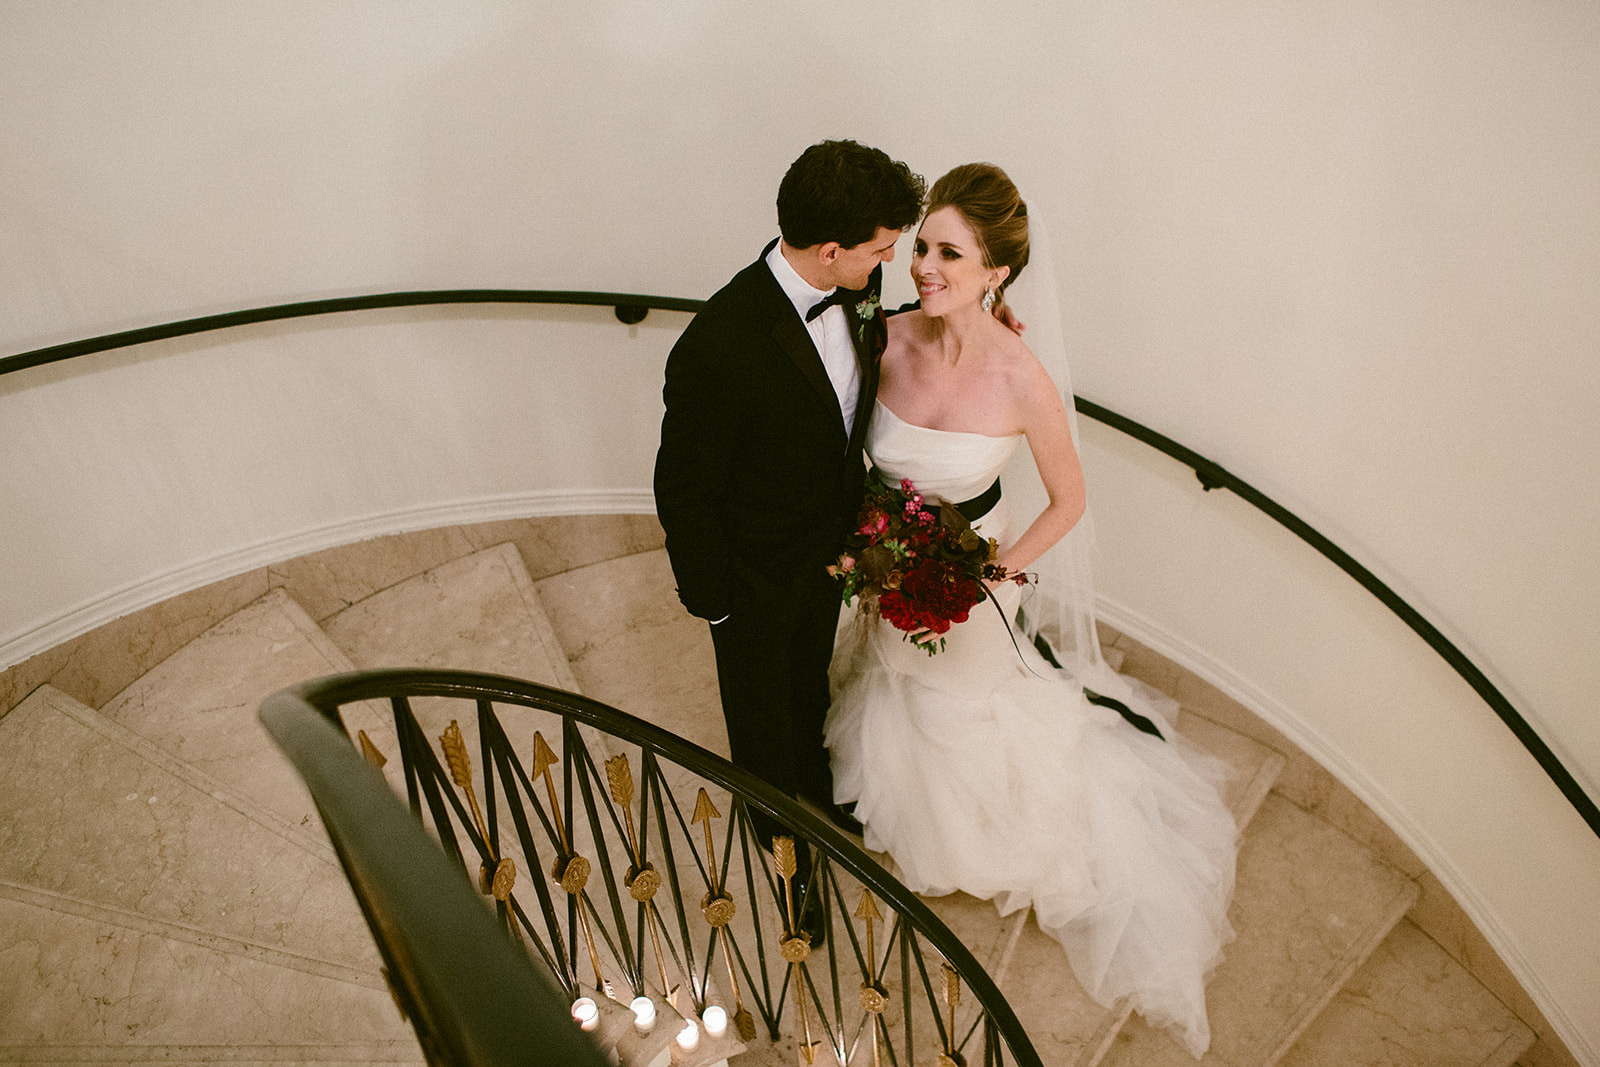 Elizabeth + Ilya by Corey Torpie Photography